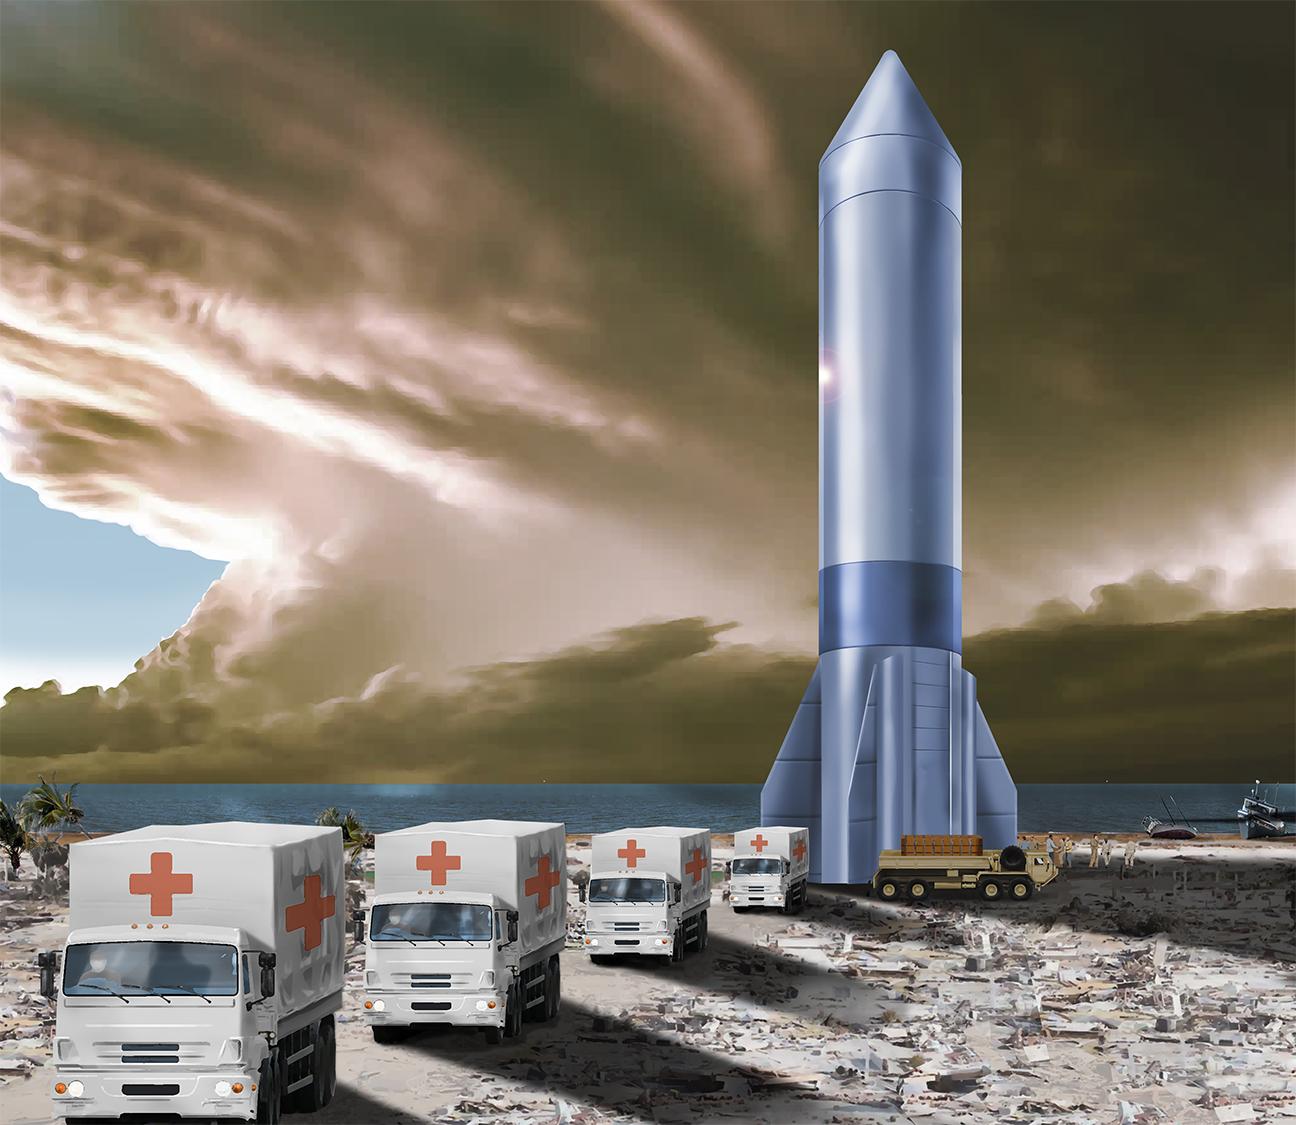 Artist's concept of a cargo rocket delivering medical supplies